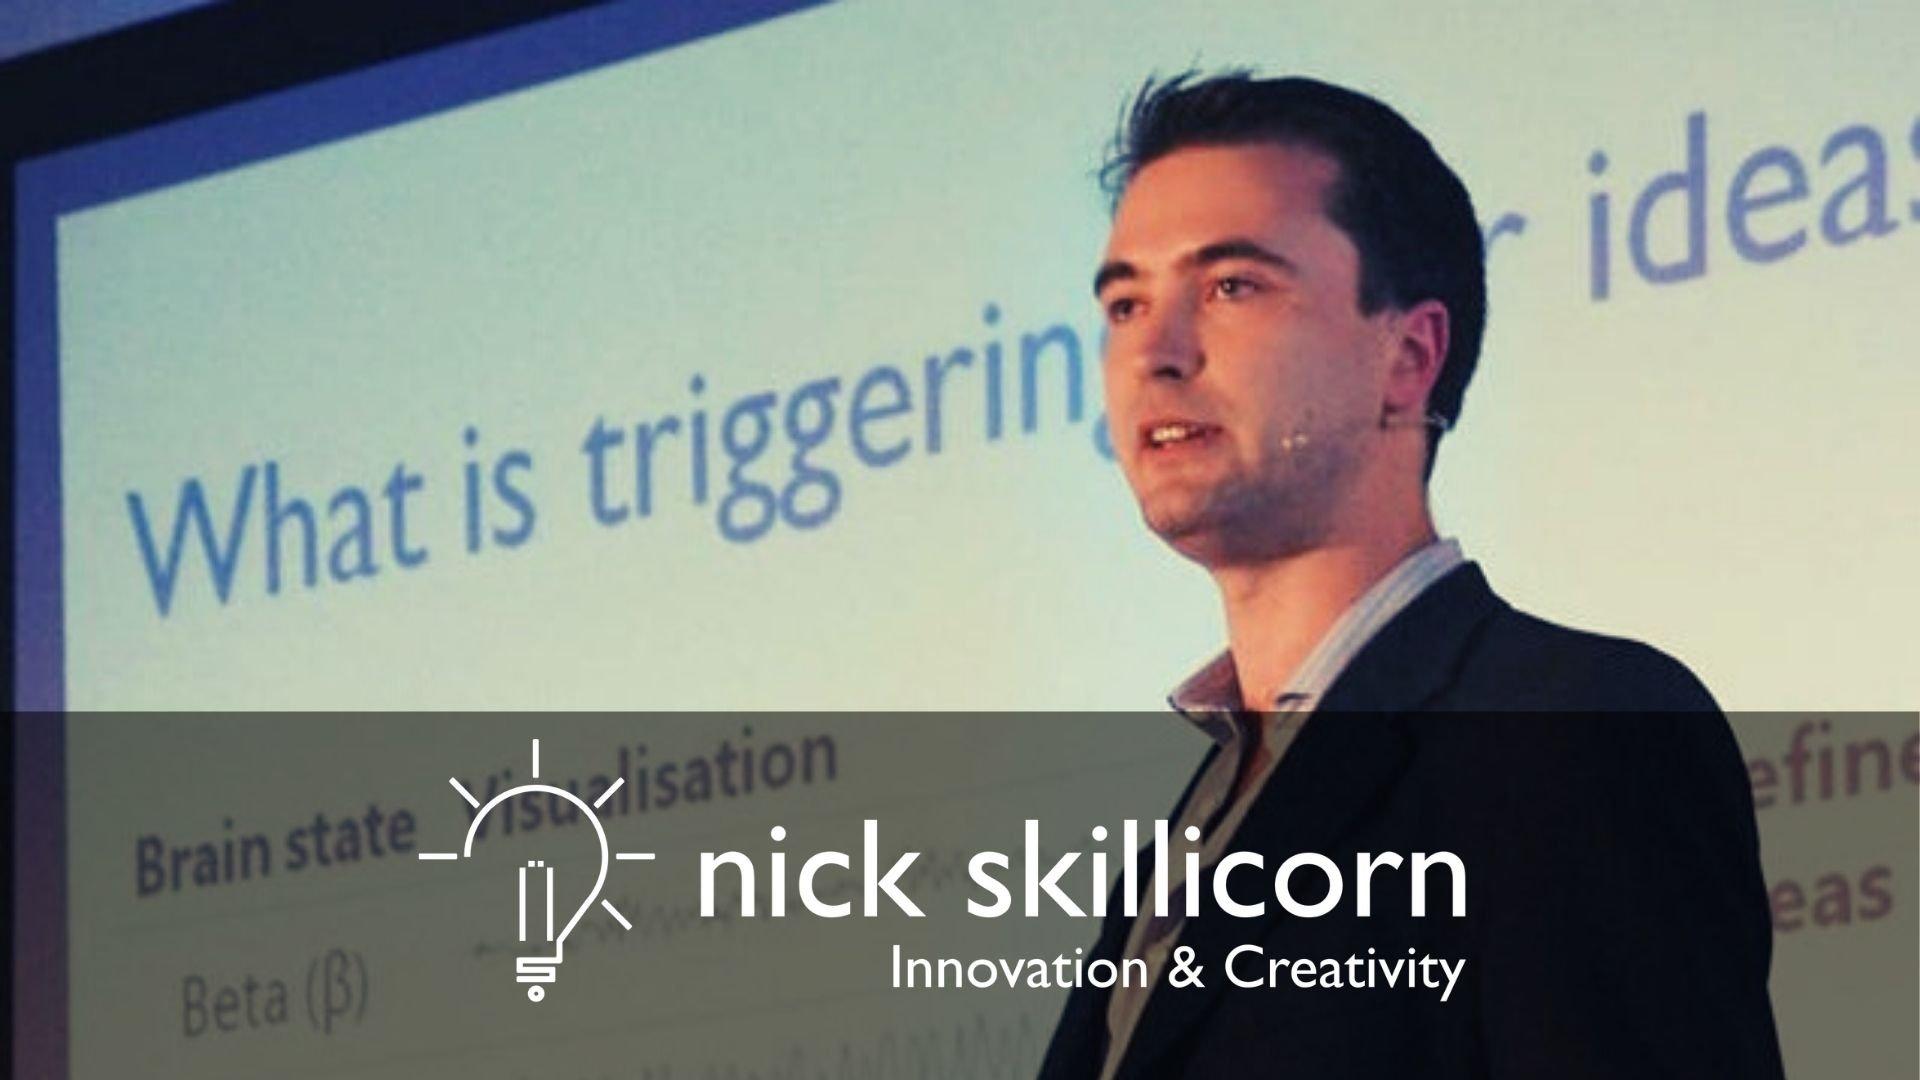 Nick Skillicorn - Innovation and Creativity expert